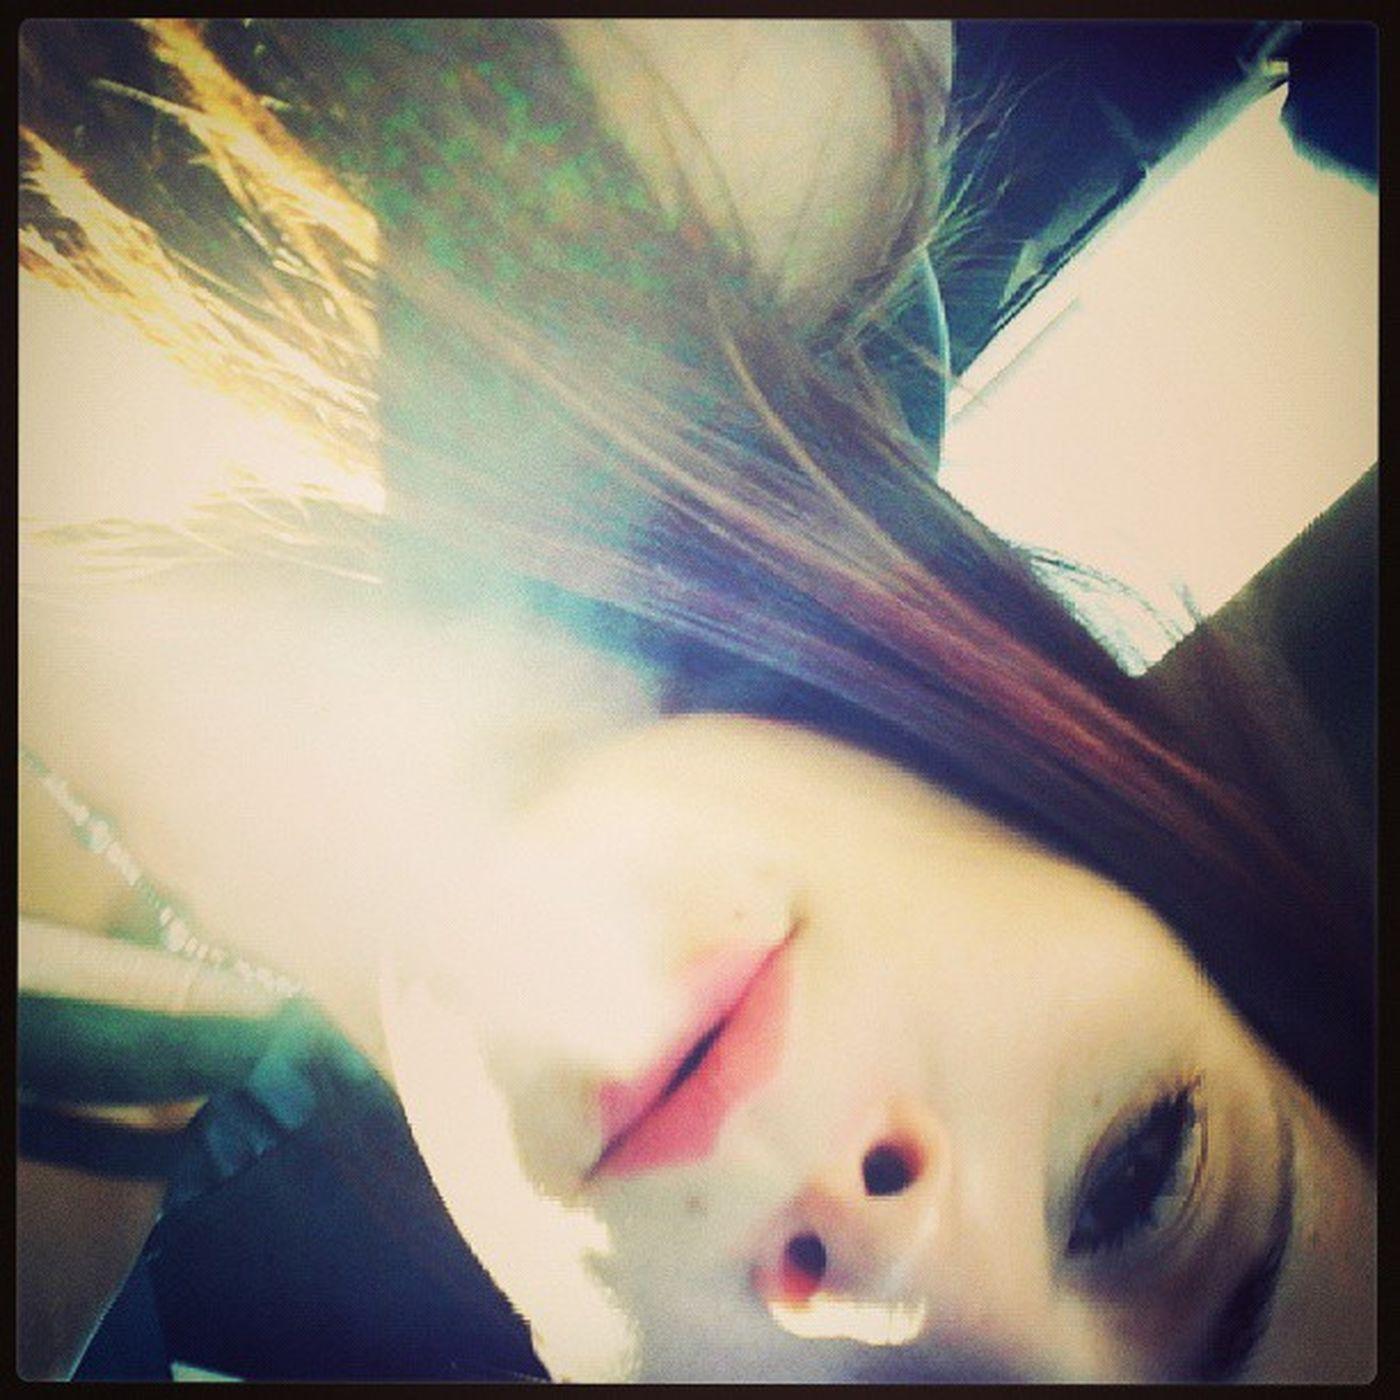 If you smoke like I smoke Youllbehigh Likeeveryday Iamlegen Waitforit dairy